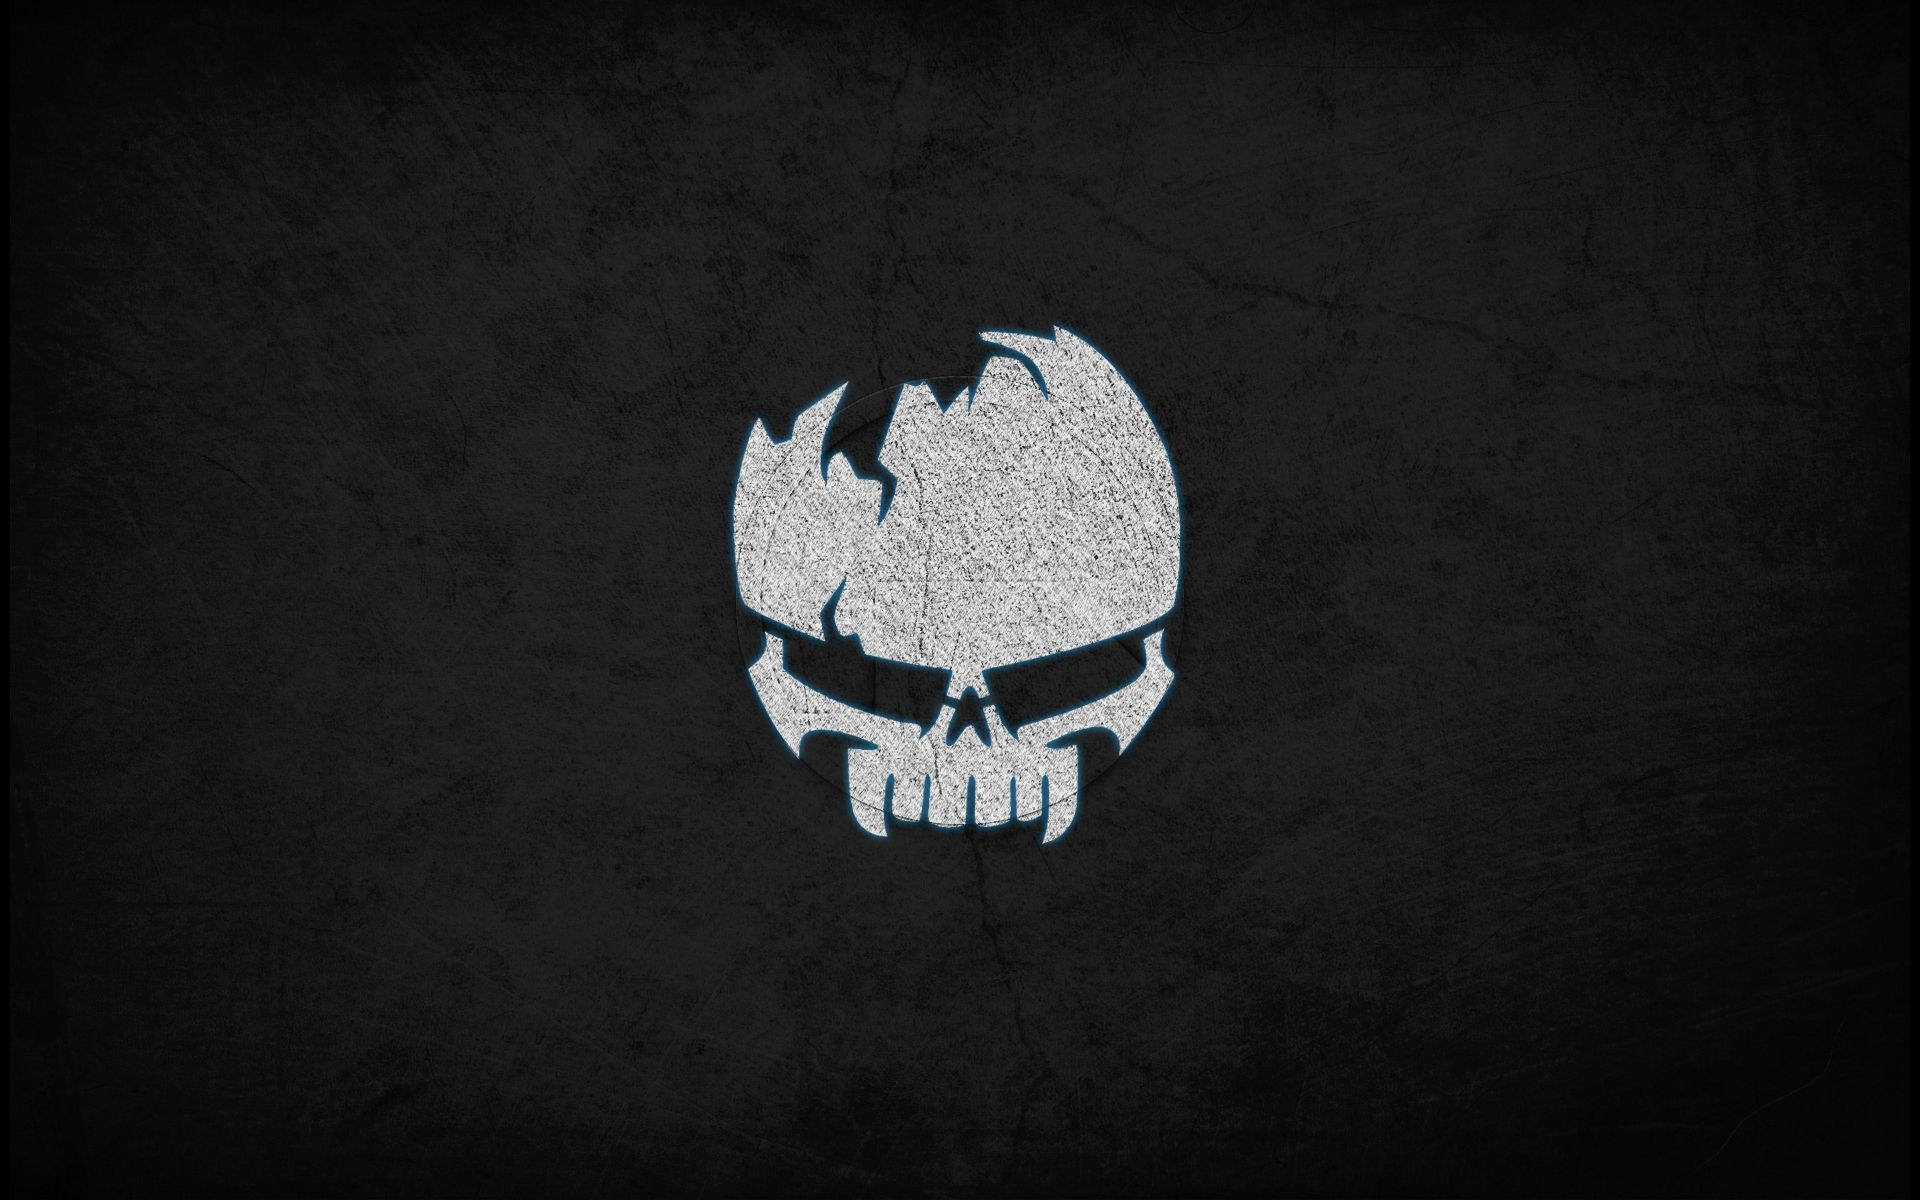 Black Skull Wallpapers - Wallpaper Cave